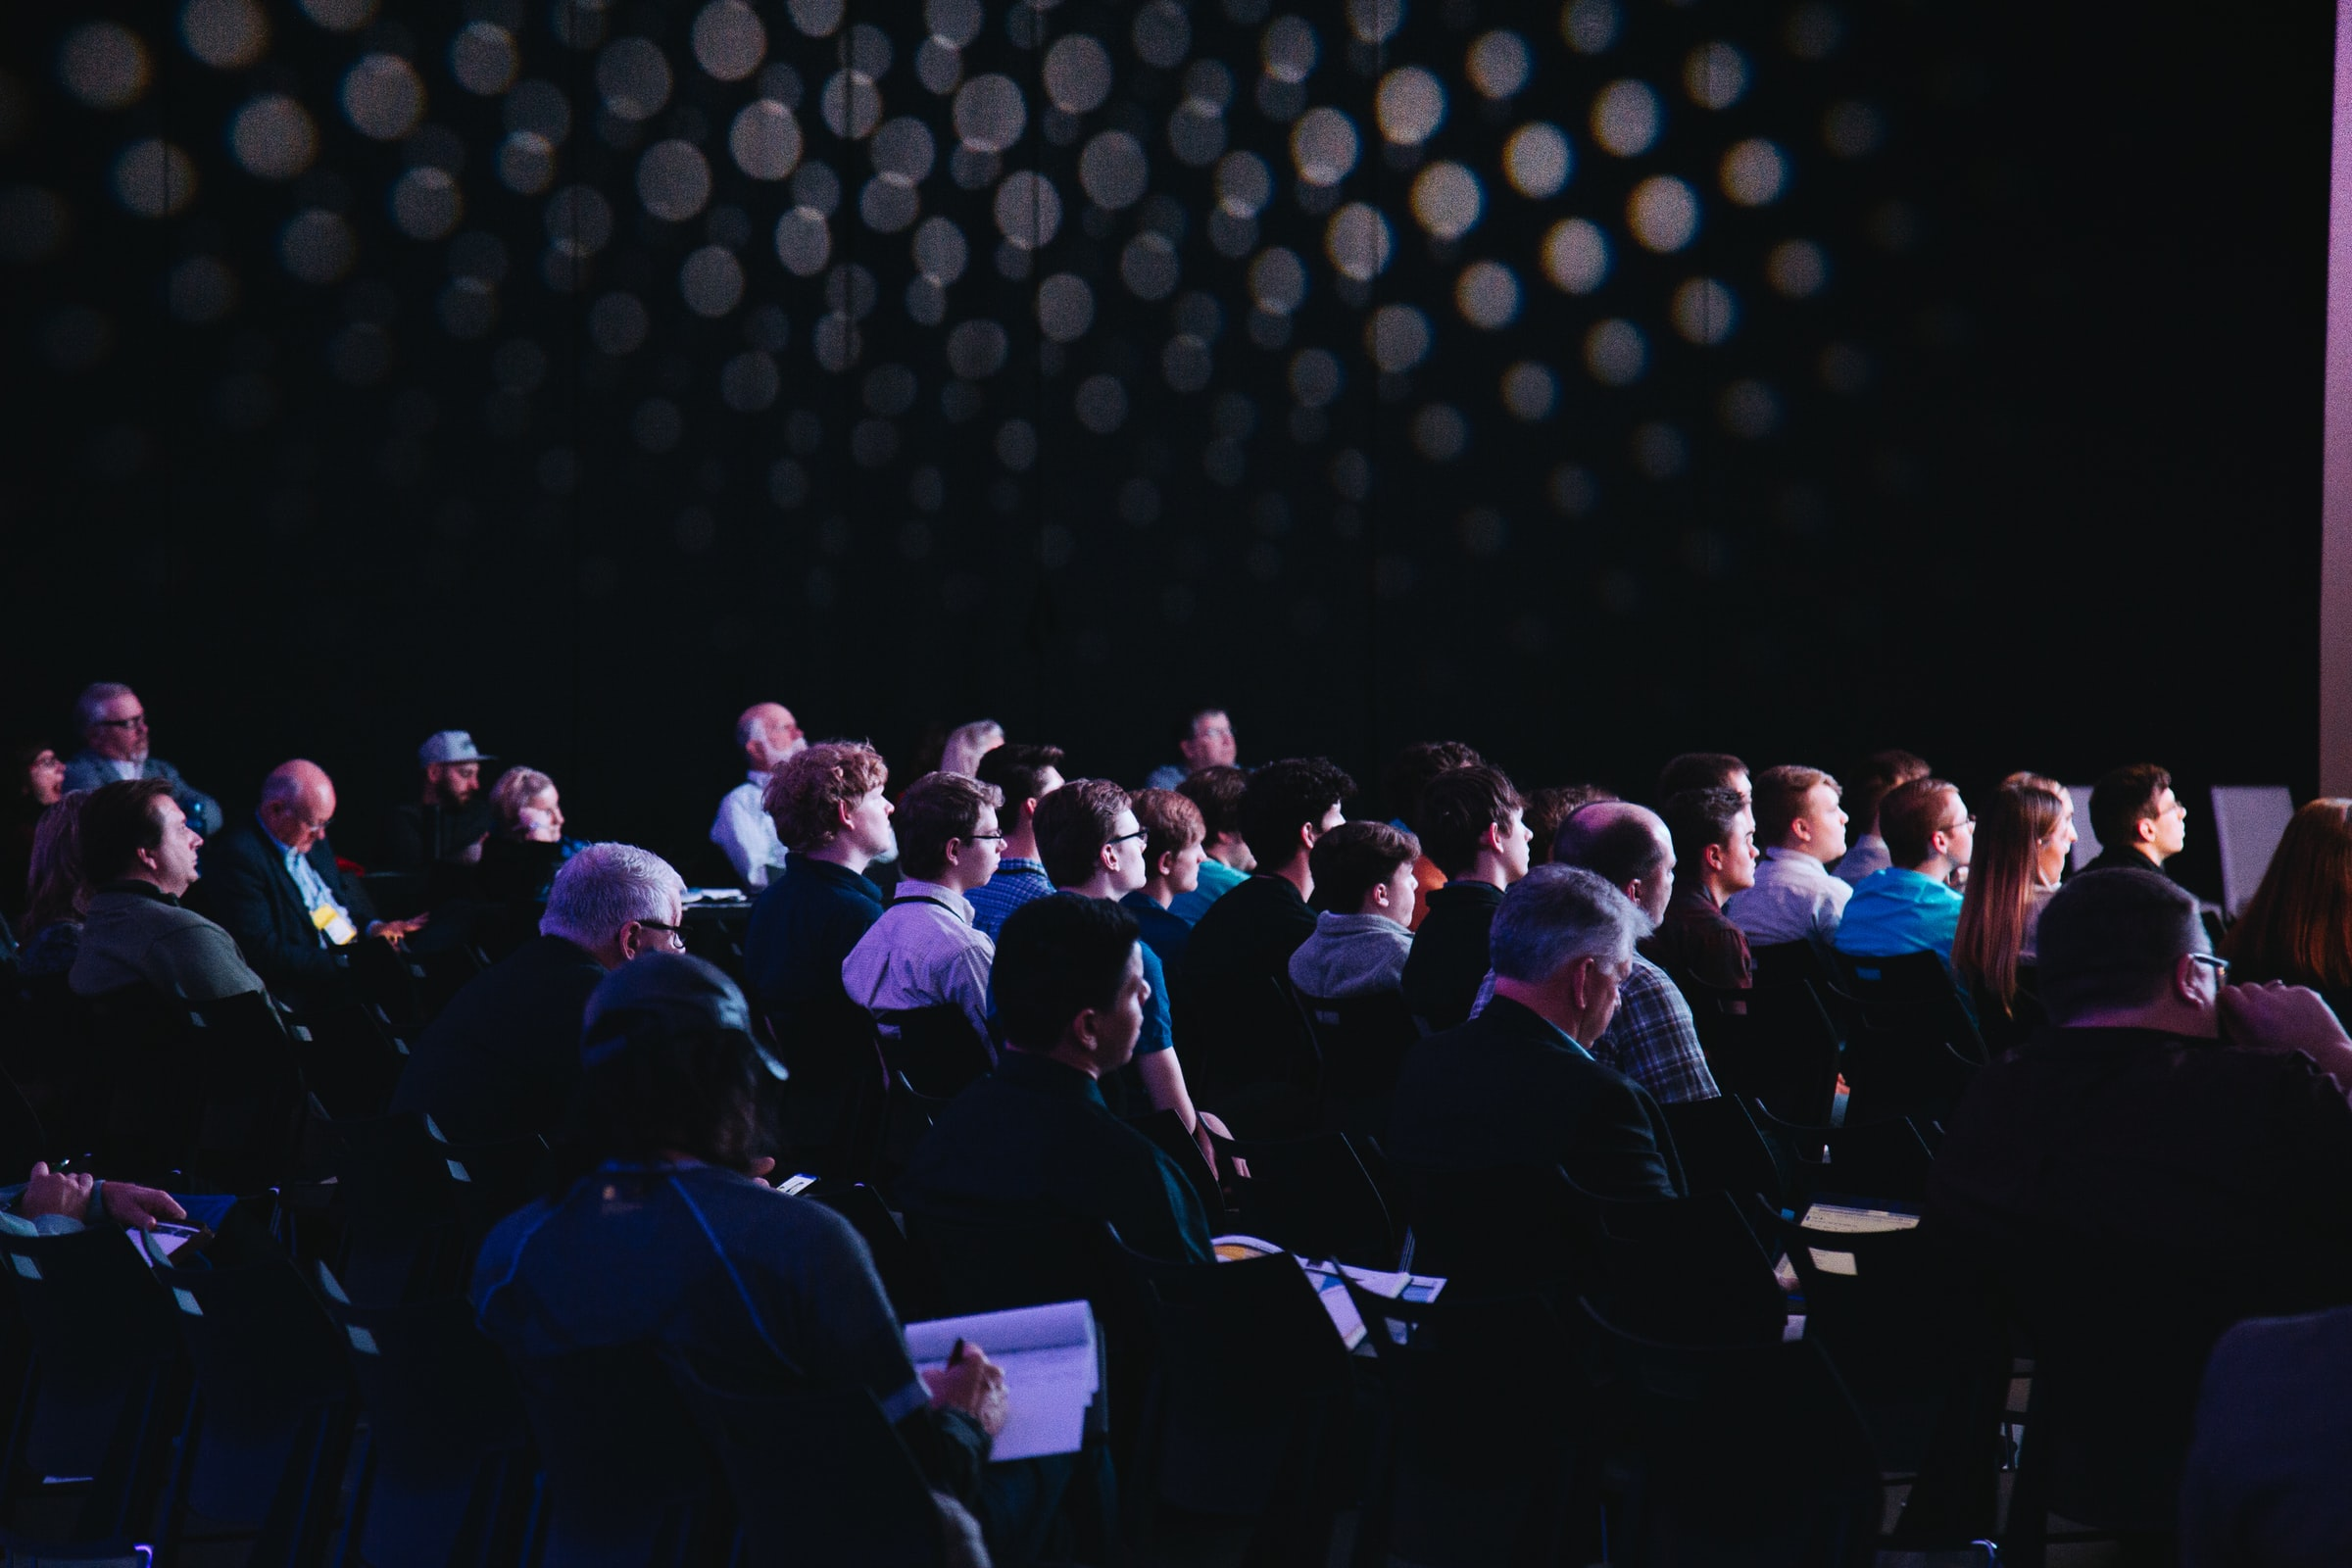 Fotografia di una stanza piena di persone sedute